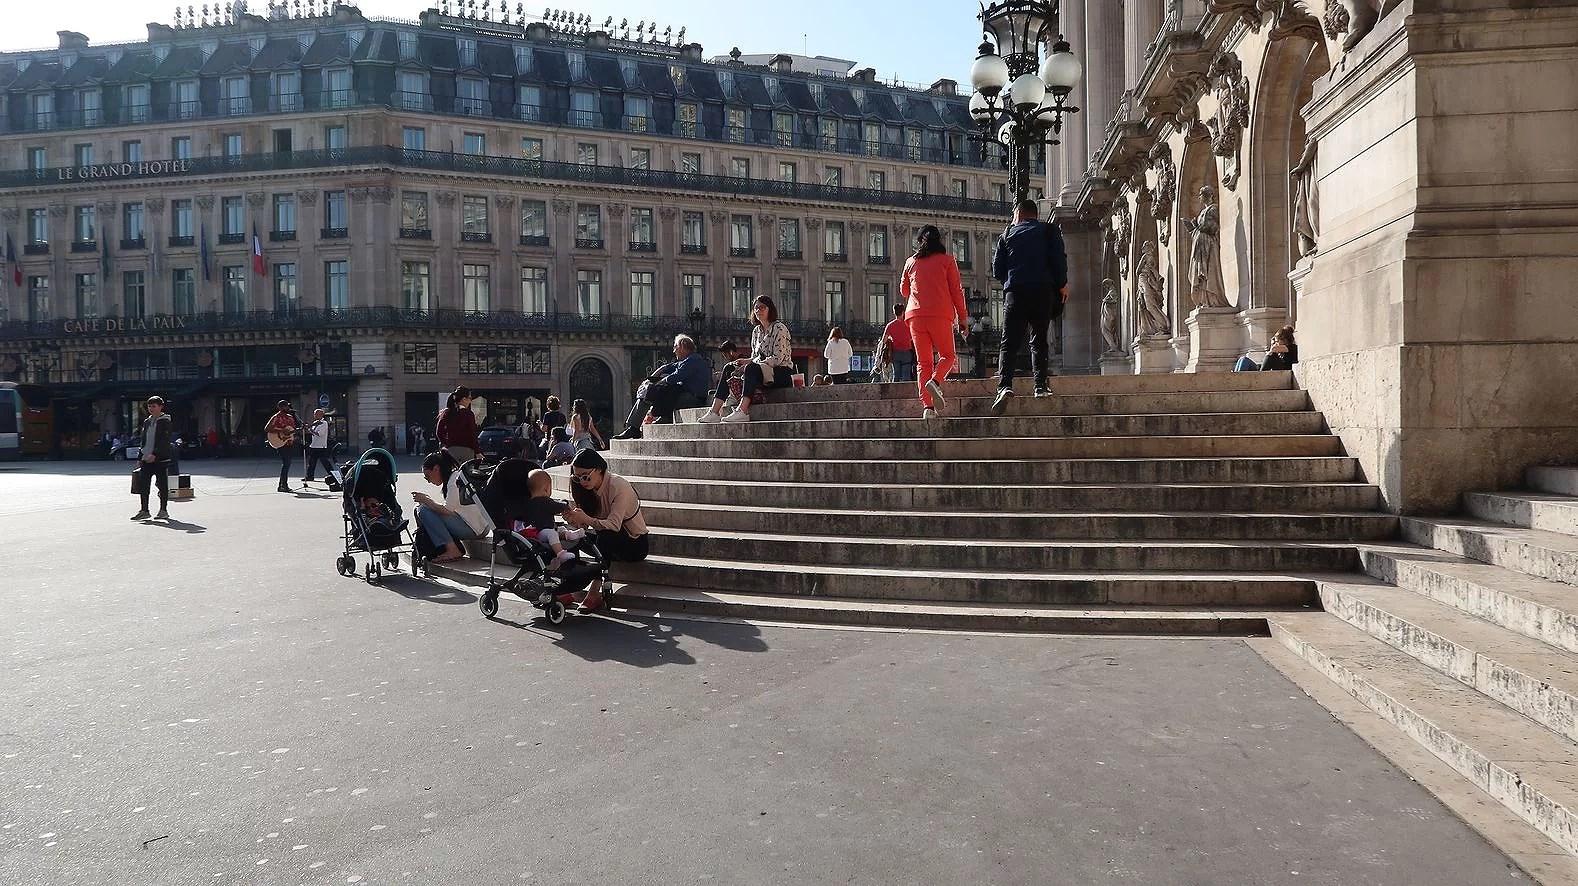 16/10-2017 - 2. dag i Paris